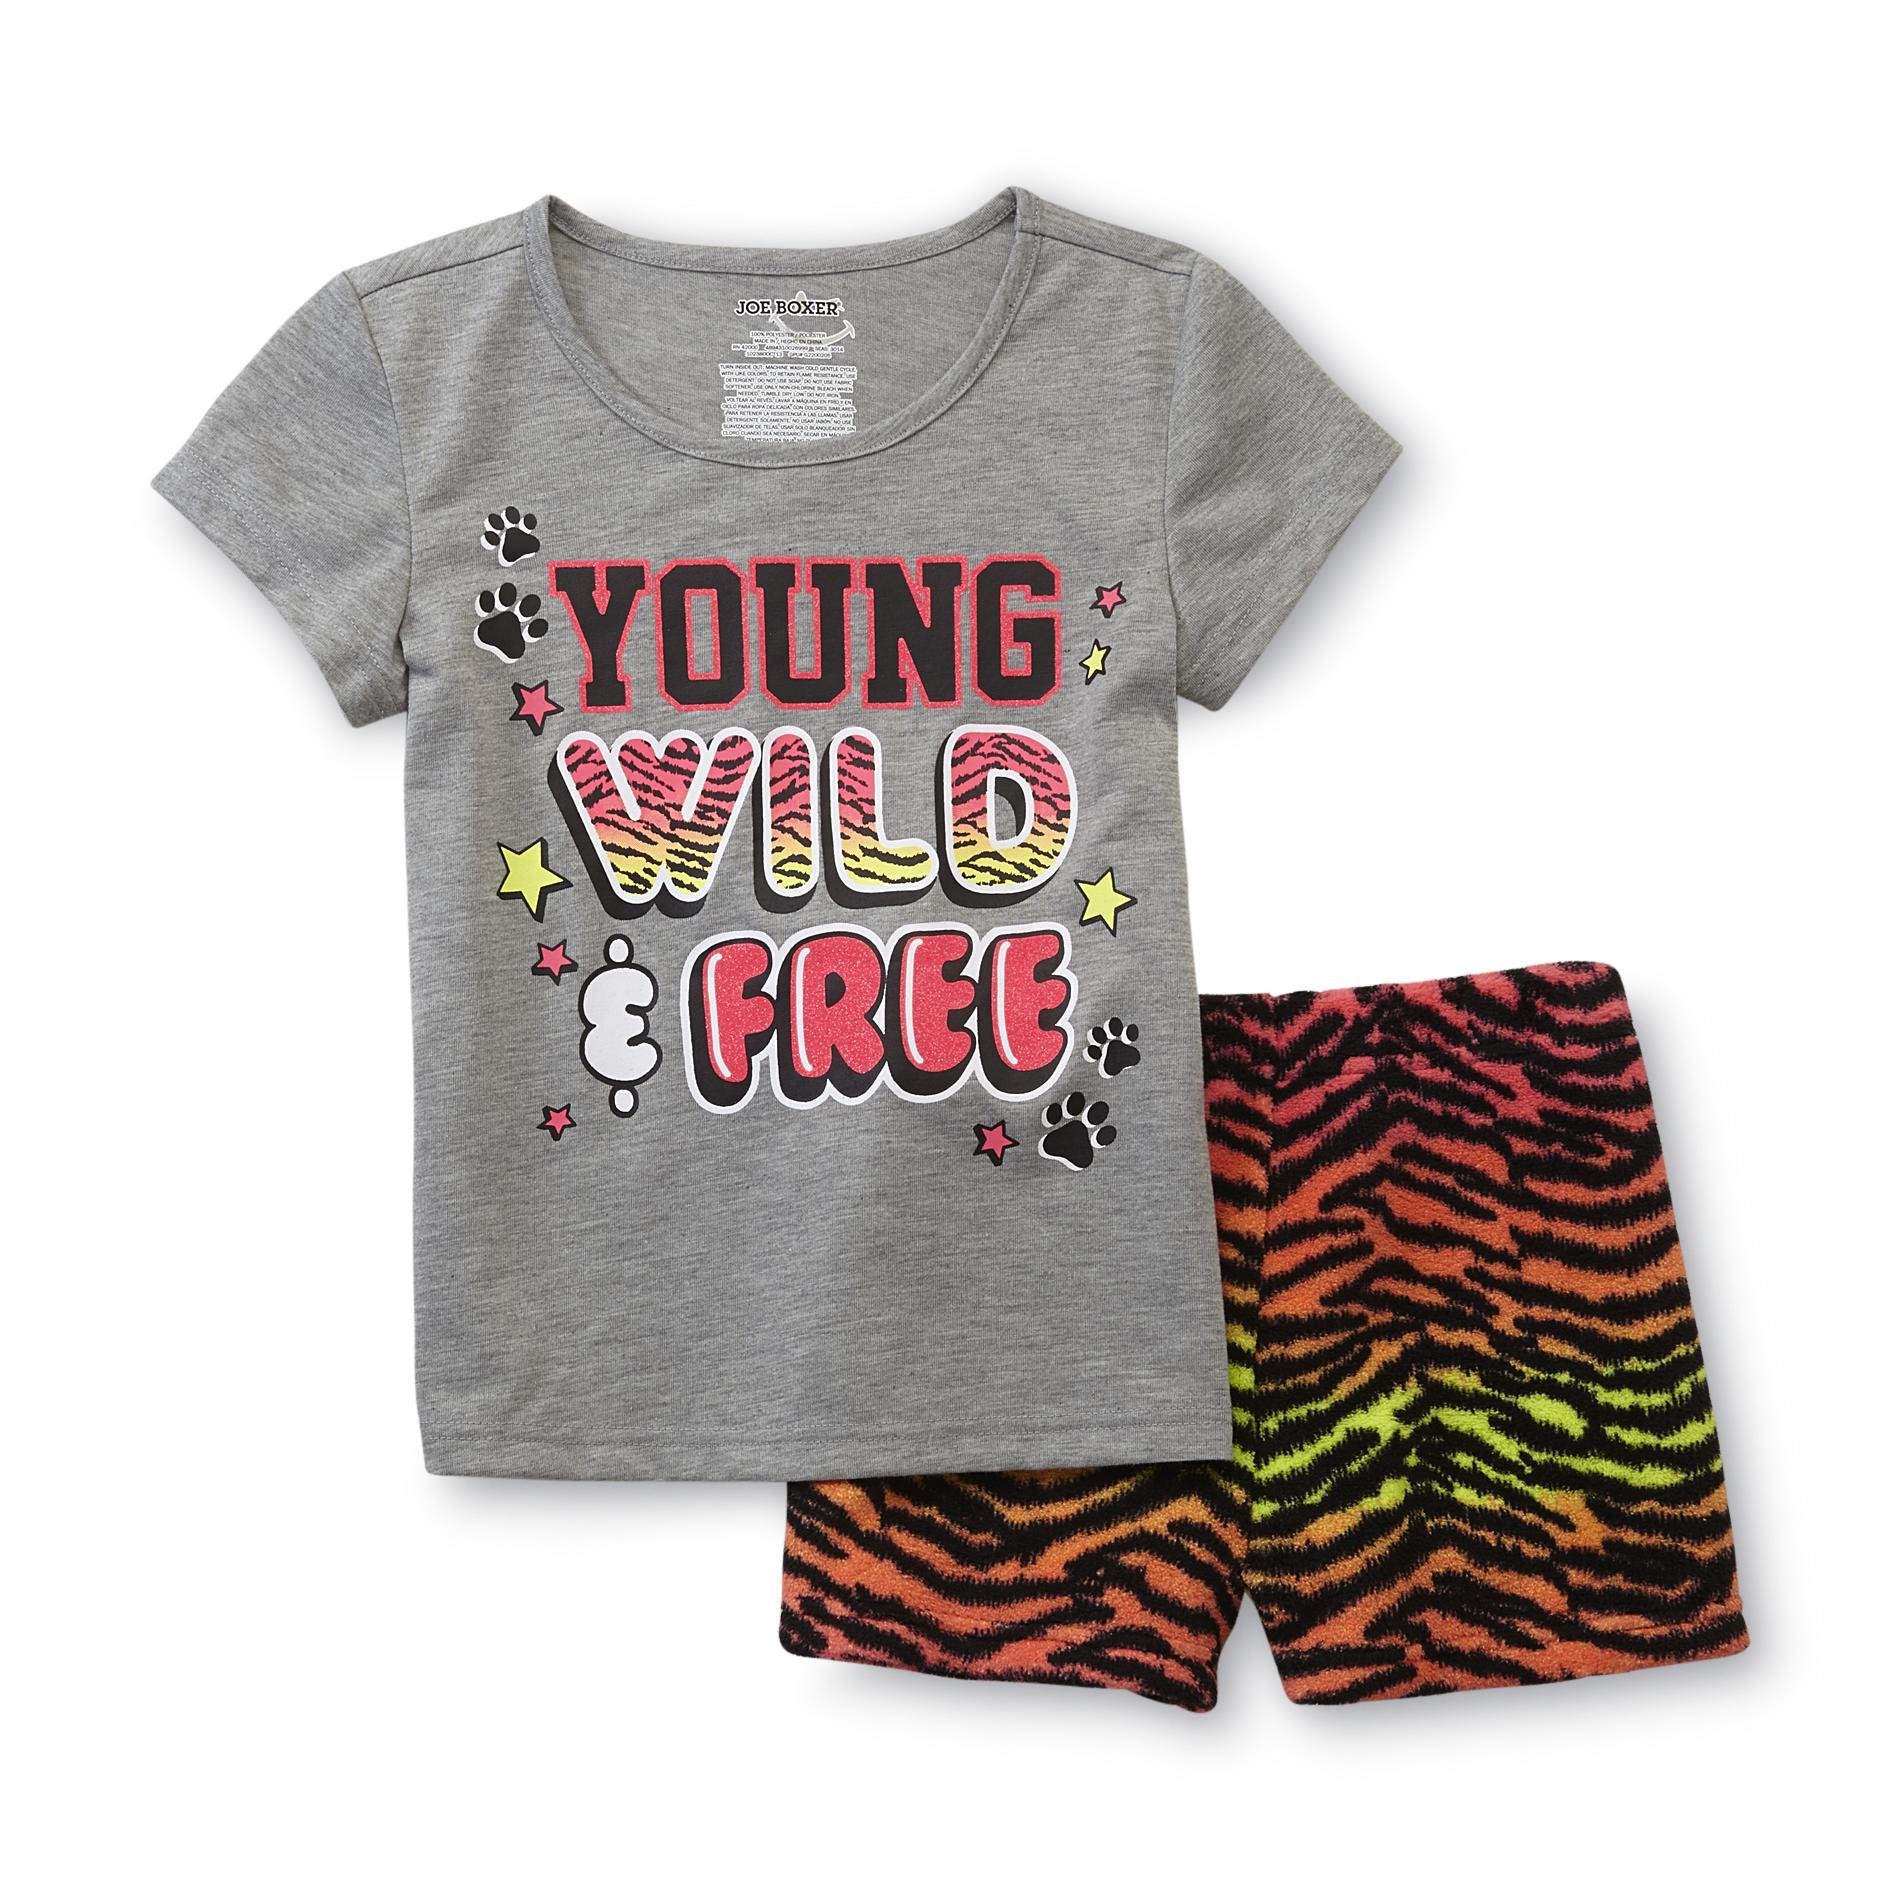 Joe Boxer Girl's Pajama T-Shirt & Shorts - Young Wild & Free